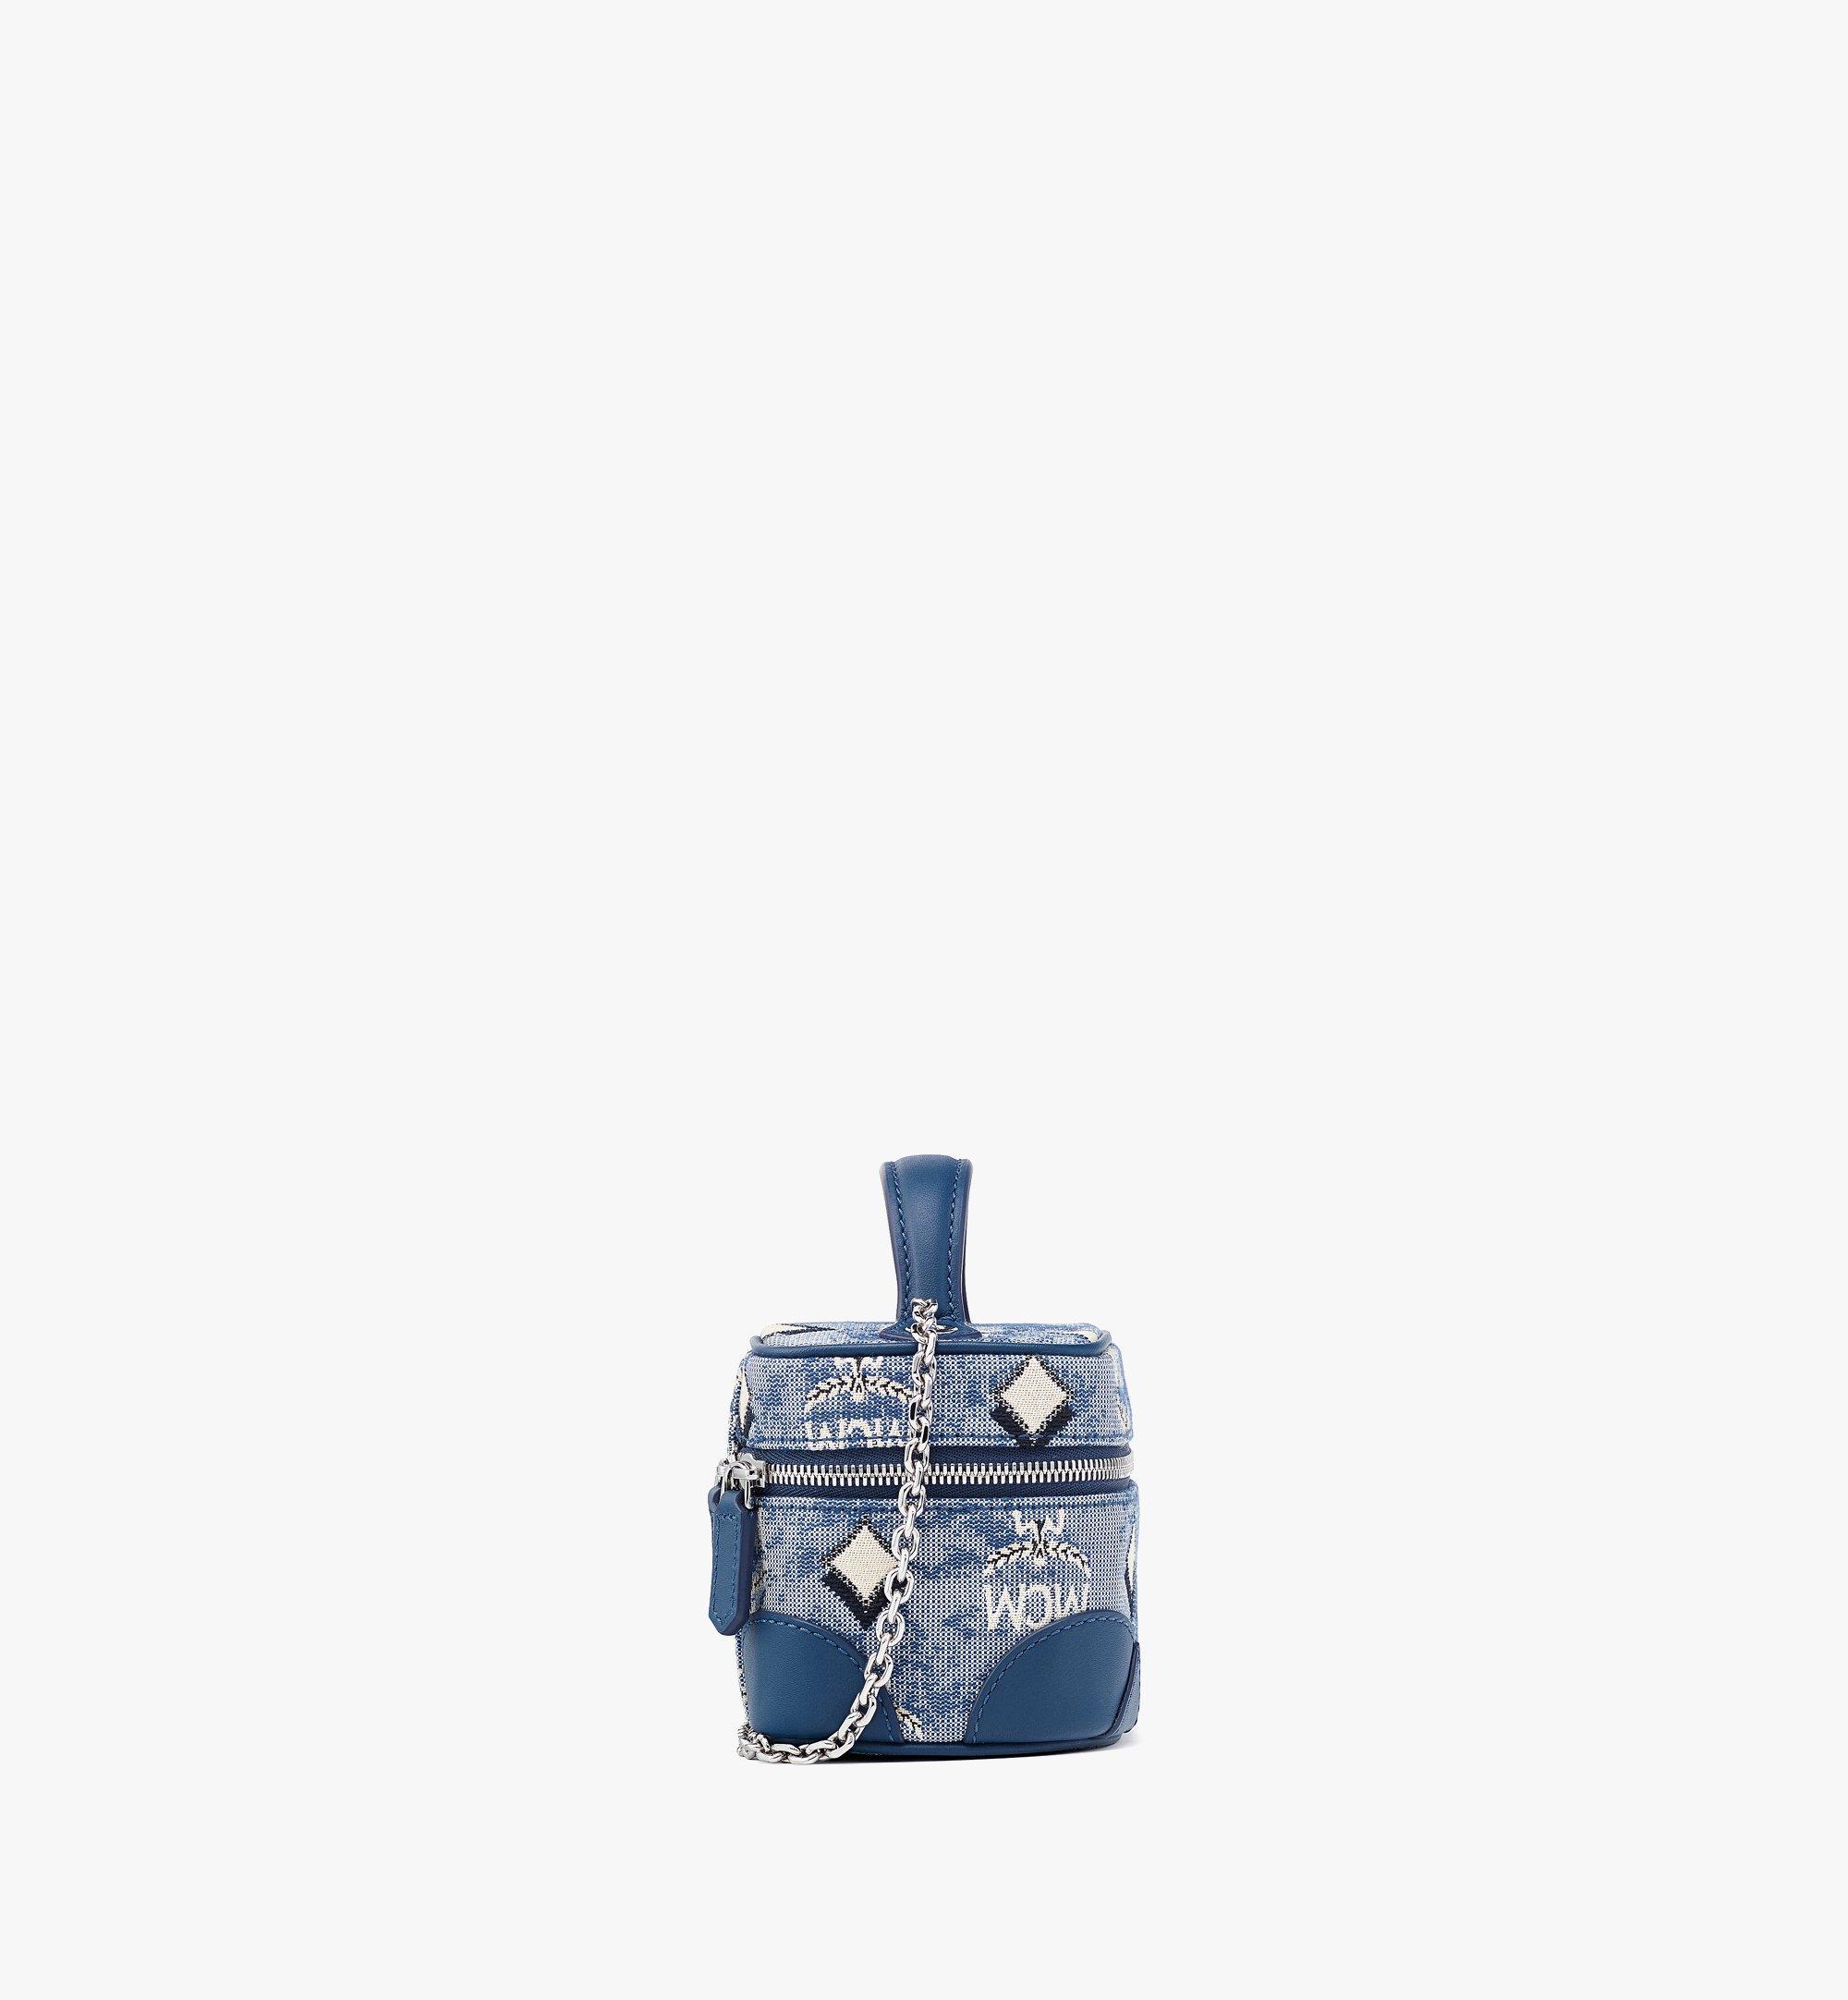 MCM Rockstar Vanity Case in Vintage Jacquard Monogram Blue MWRBATQ02LU001 Alternate View 1